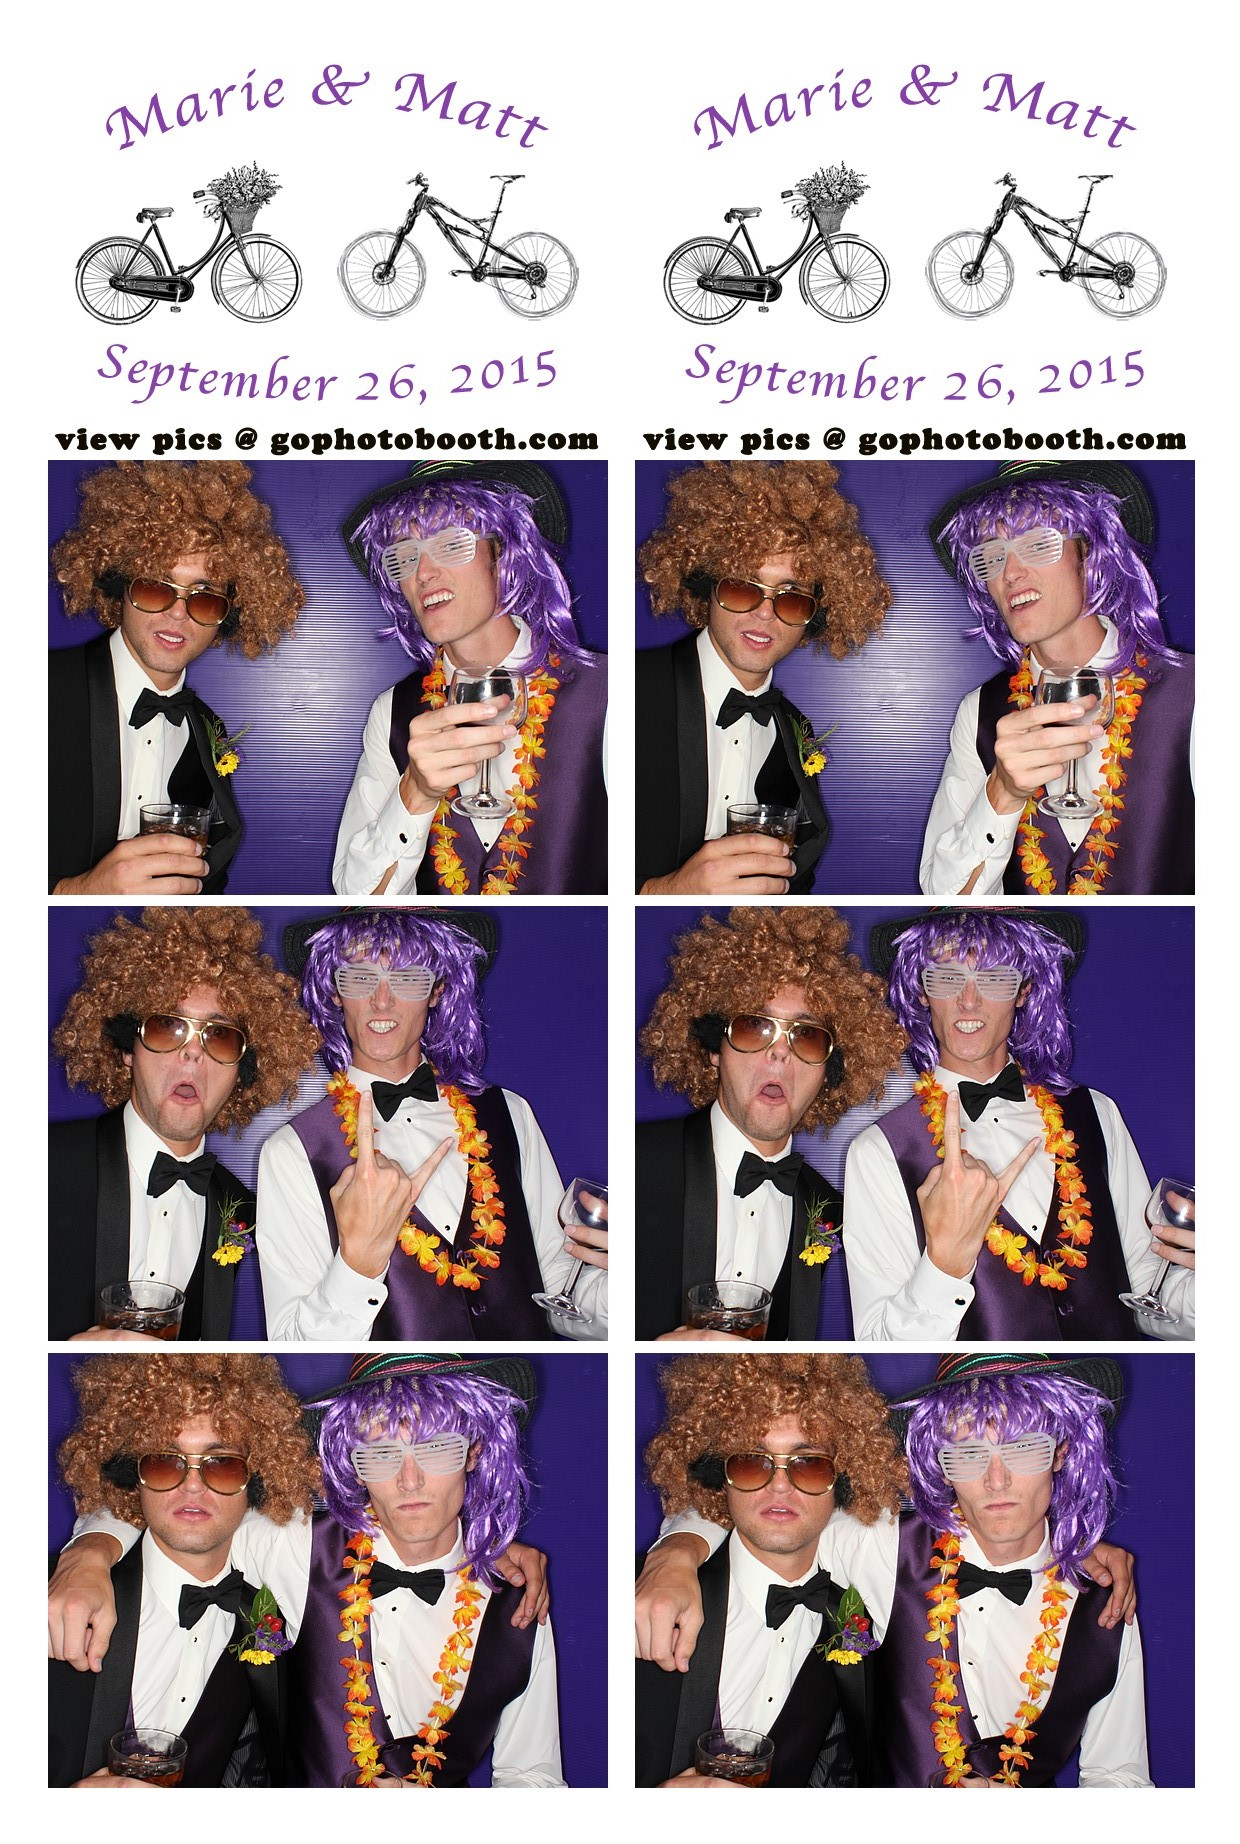 Marie & Matt- Donovan Pavilion, Vail 09/26/15